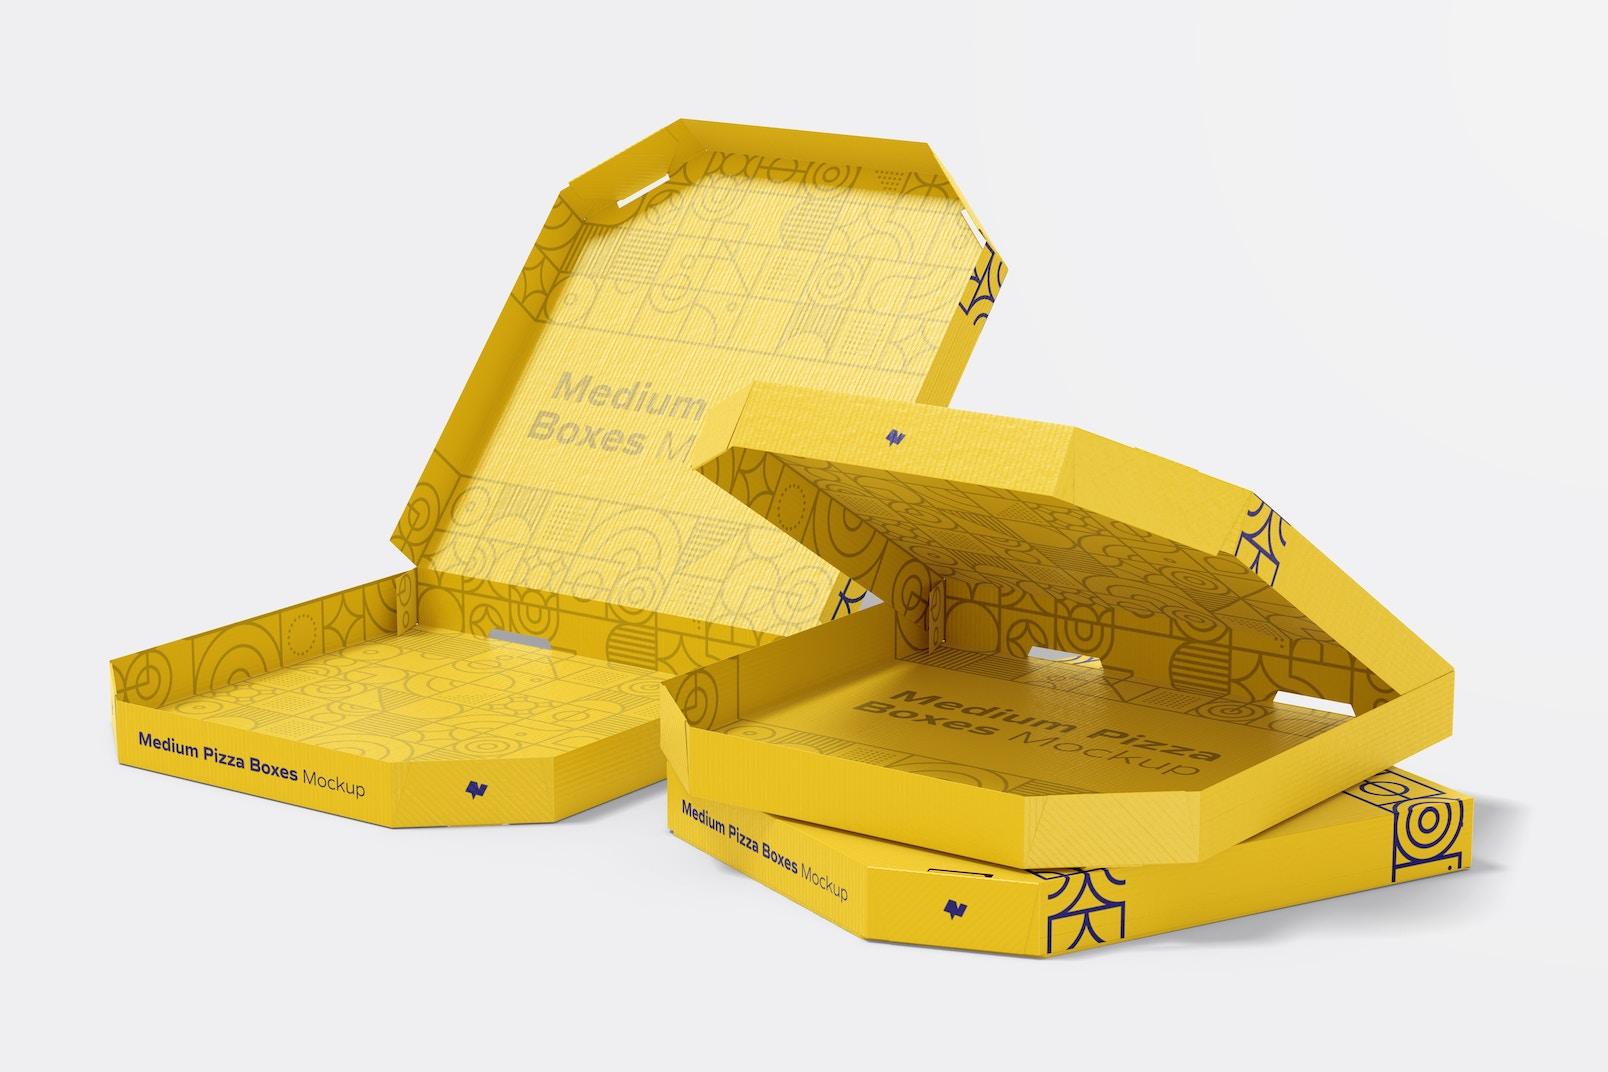 Medium Pizza Boxes Mockup